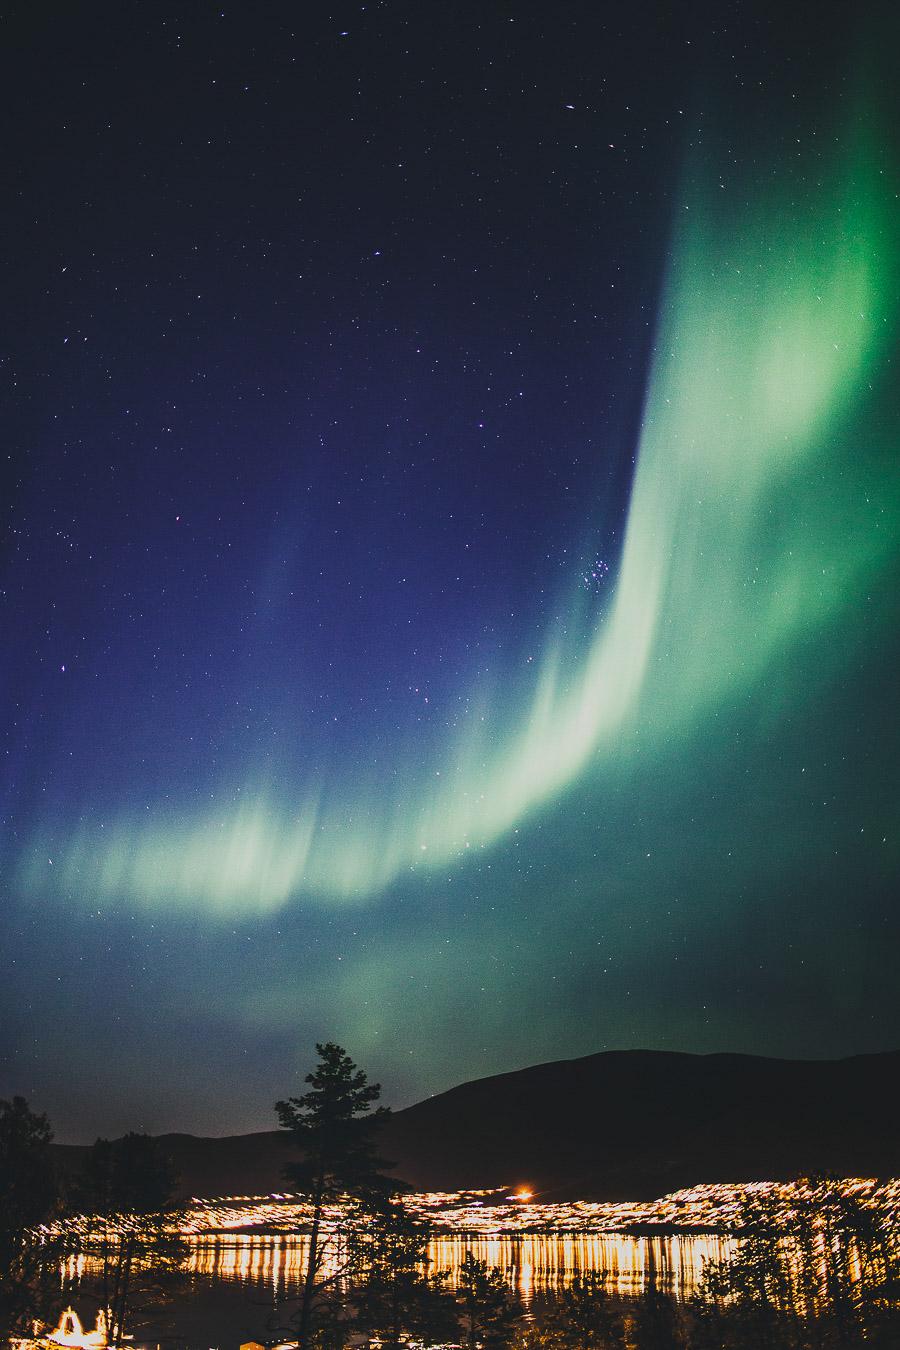 Those northern lights